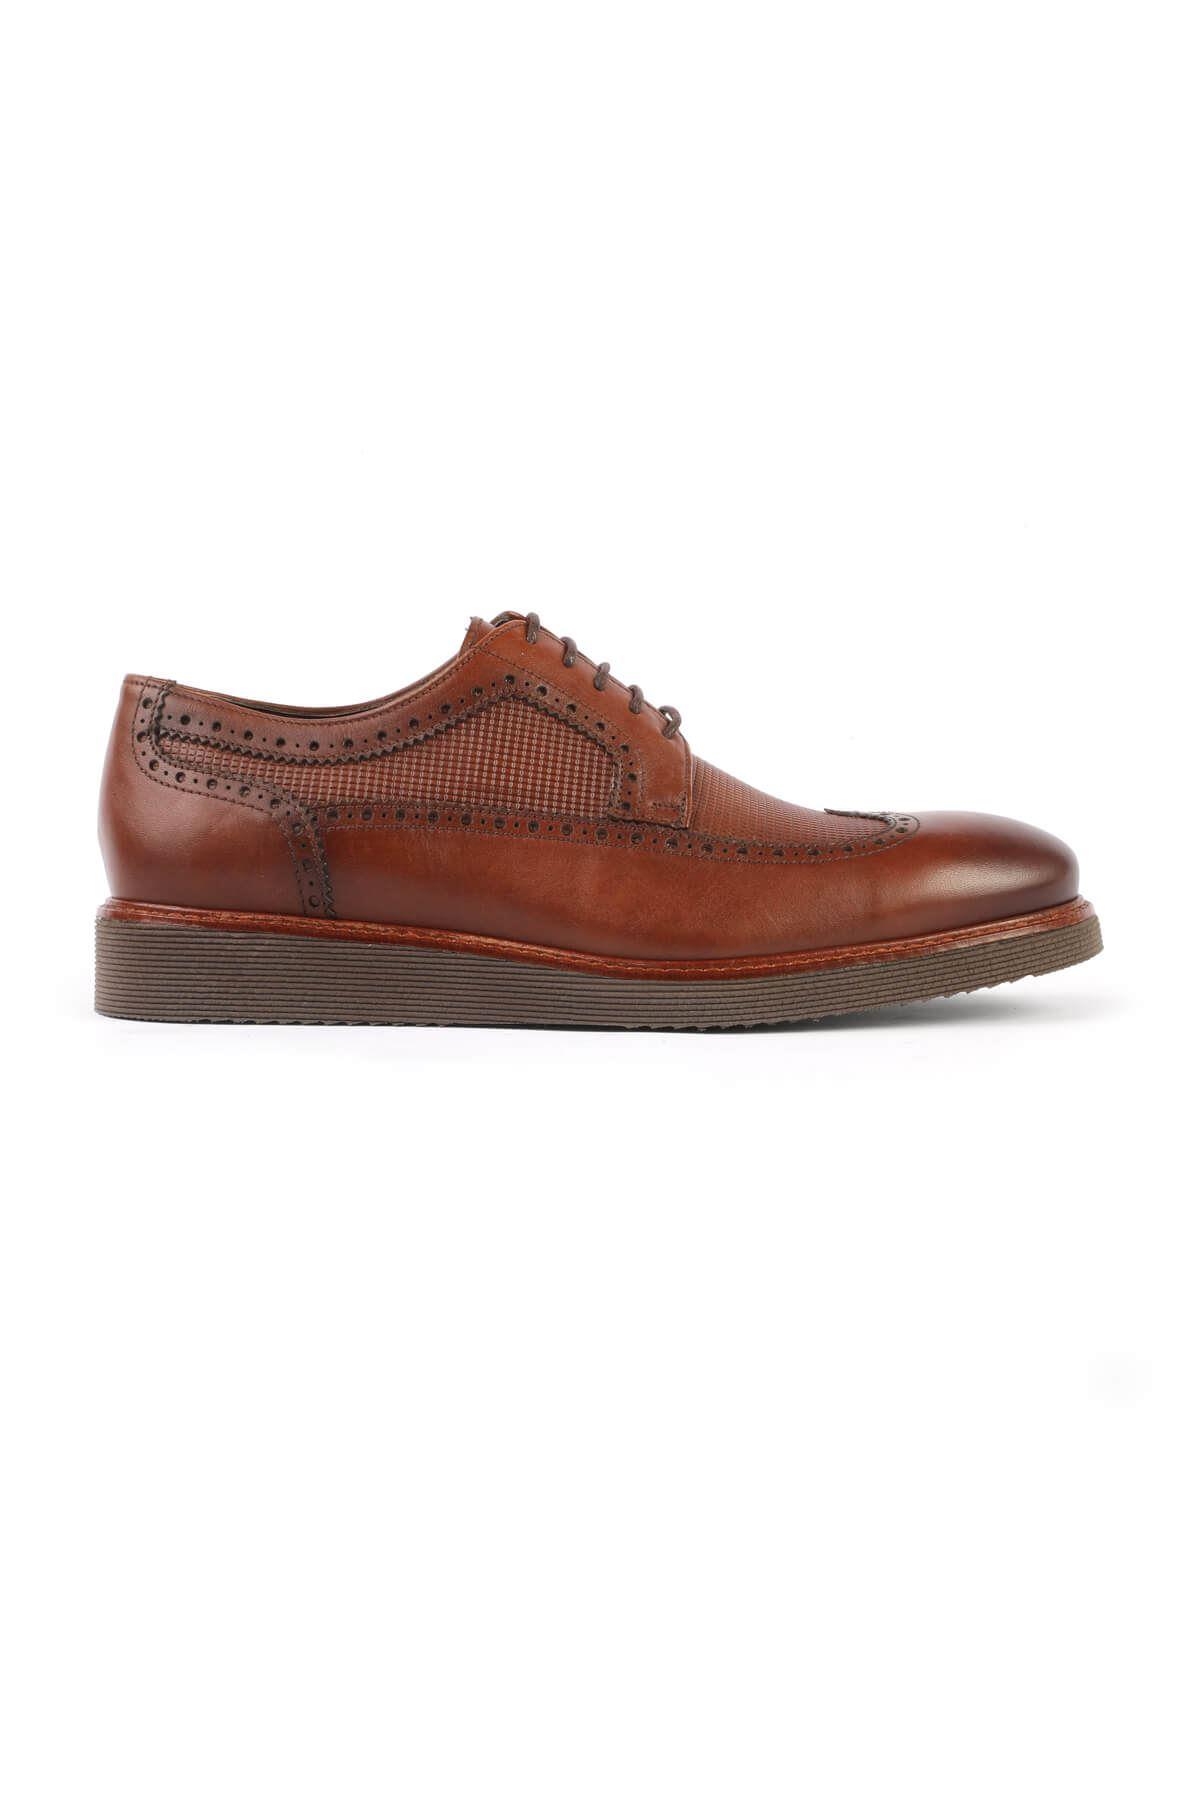 Libero C631 Brown Oxford Shoes